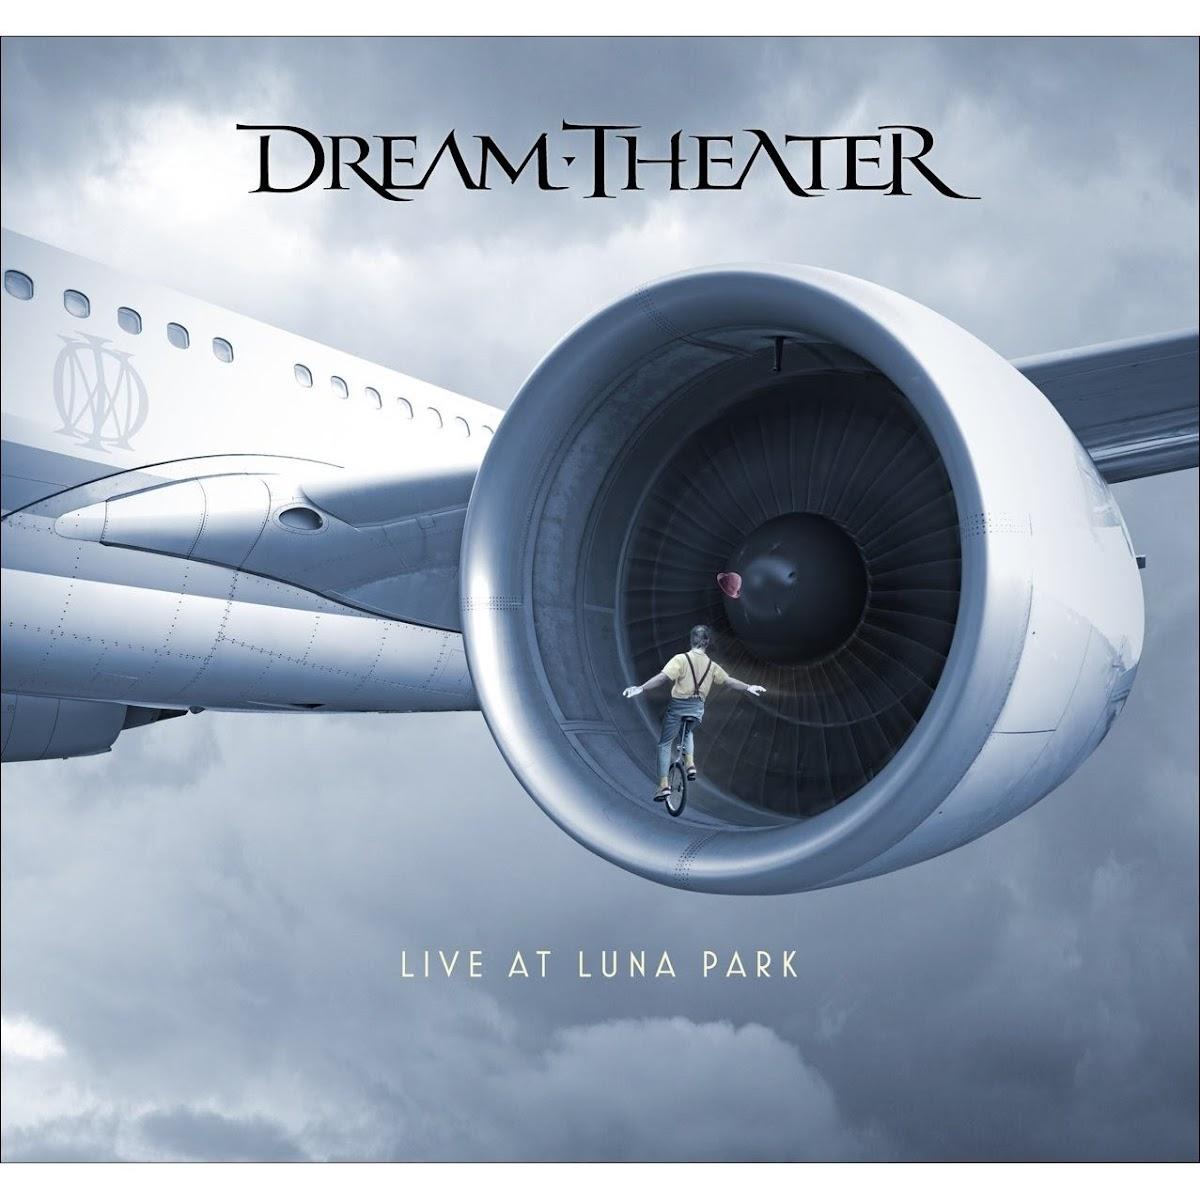 http://3.bp.blogspot.com/-Kilgwxv1BSc/Ui7tTmvOsGI/AAAAAAAAka4/9KqJL70ymJY/s1200/Dream-Theater-Live-At-Luna-Park.jpg